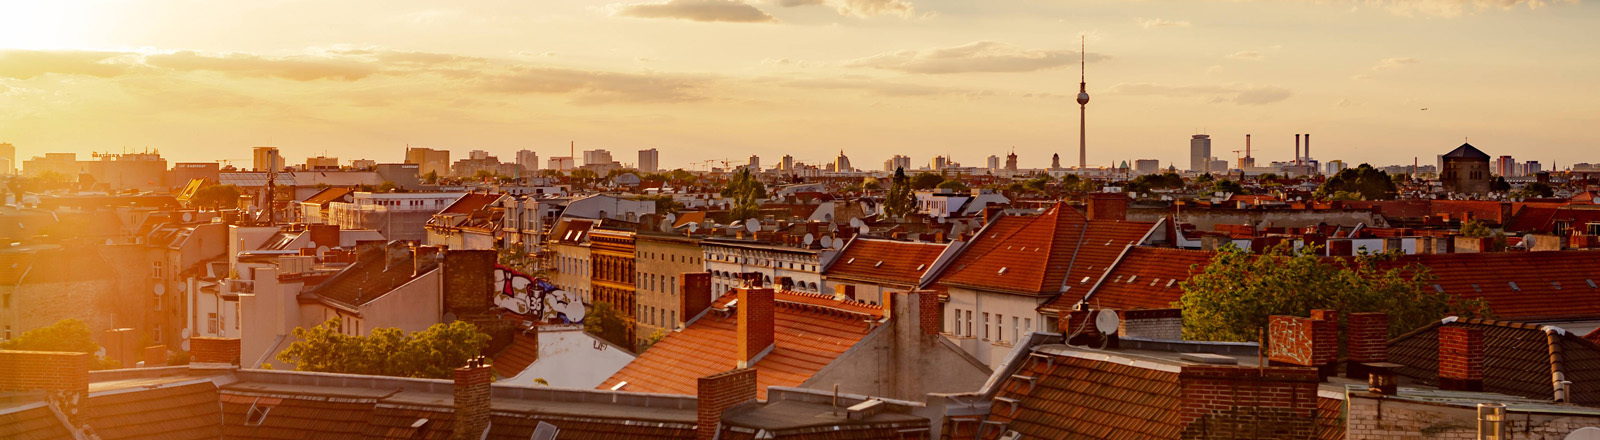 Skyline Berlins bei Sonnenuntergang